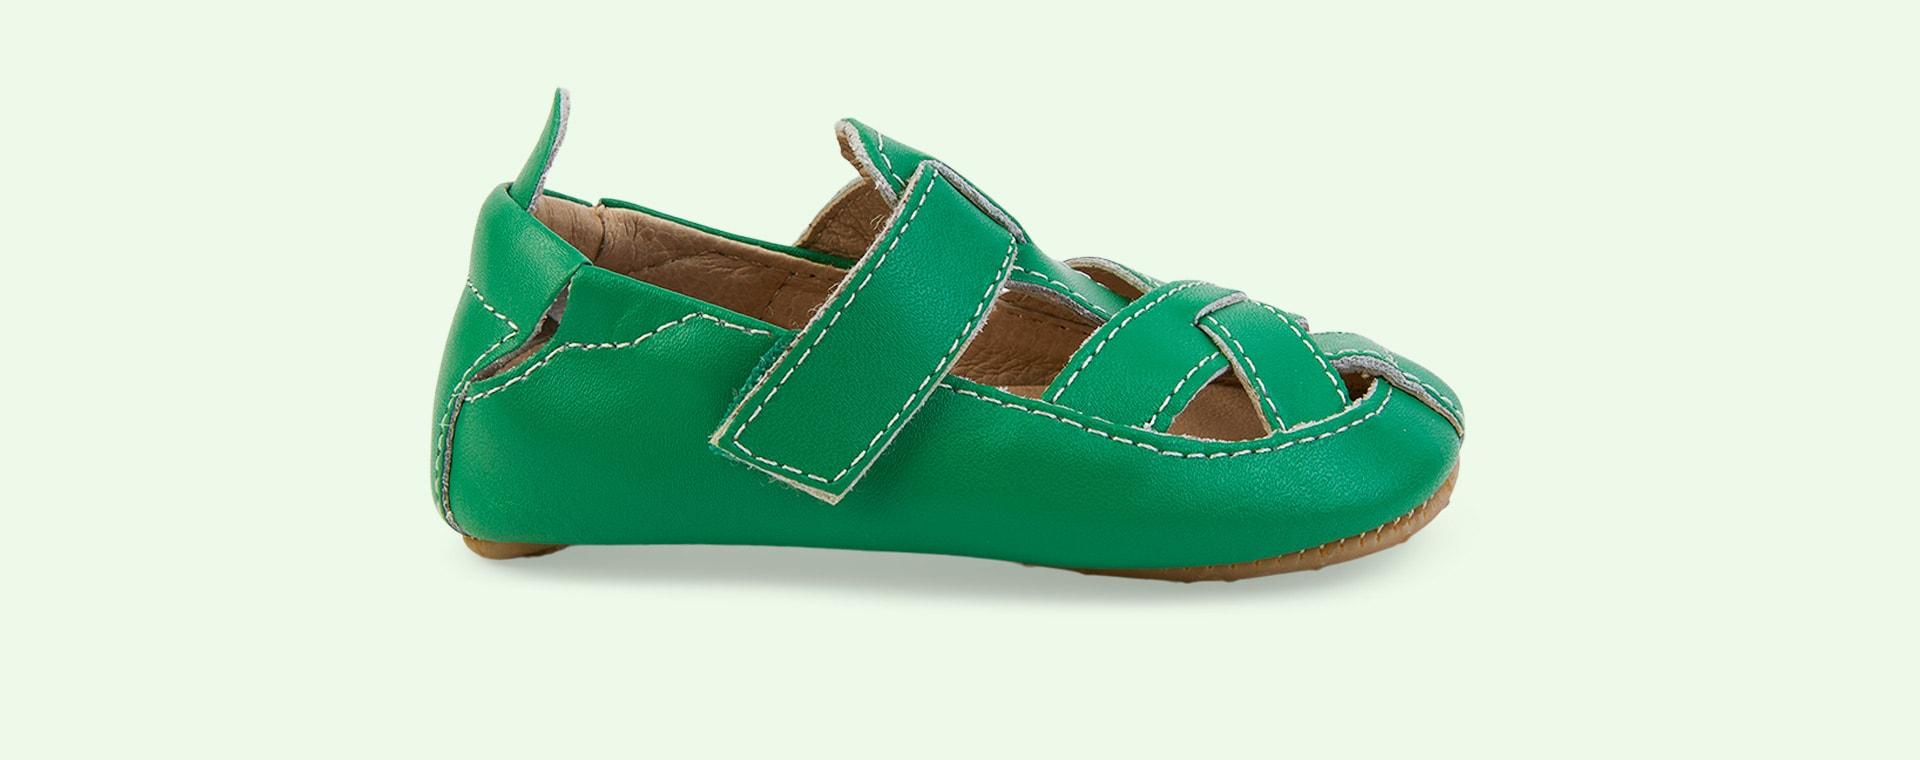 Neon Green old soles Thread Shoe